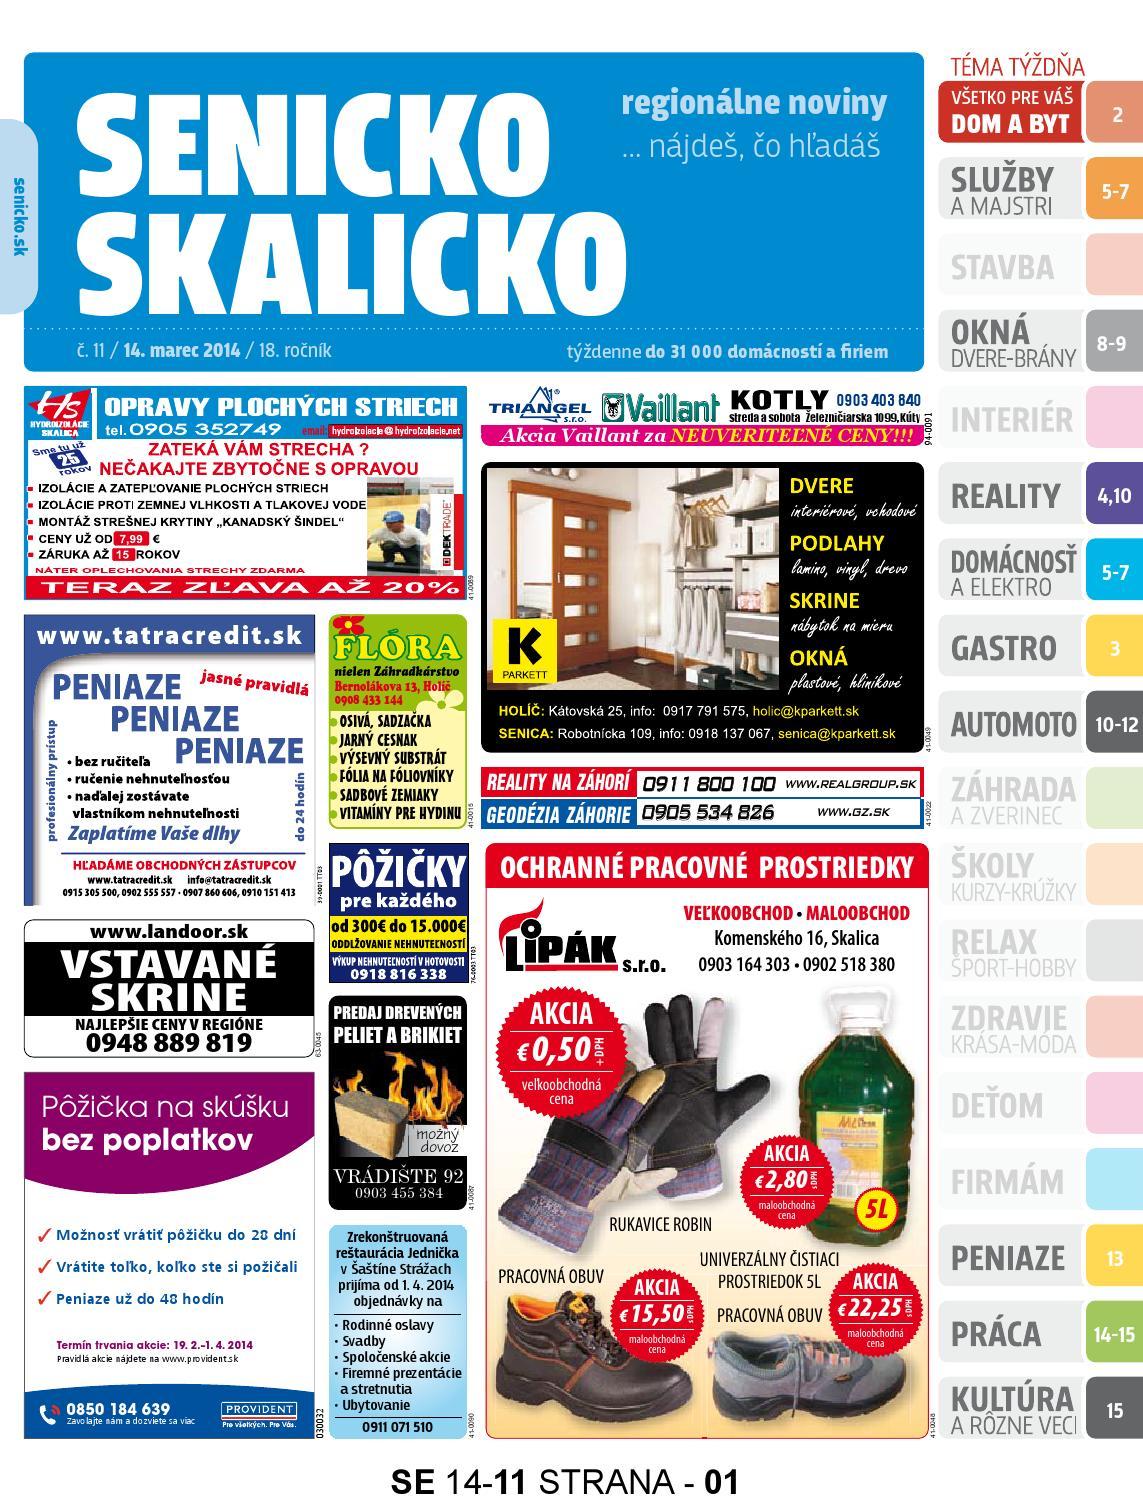 1c004dee7613 Senicko-Skalicko 14-11 by skalicko skalicko - issuu